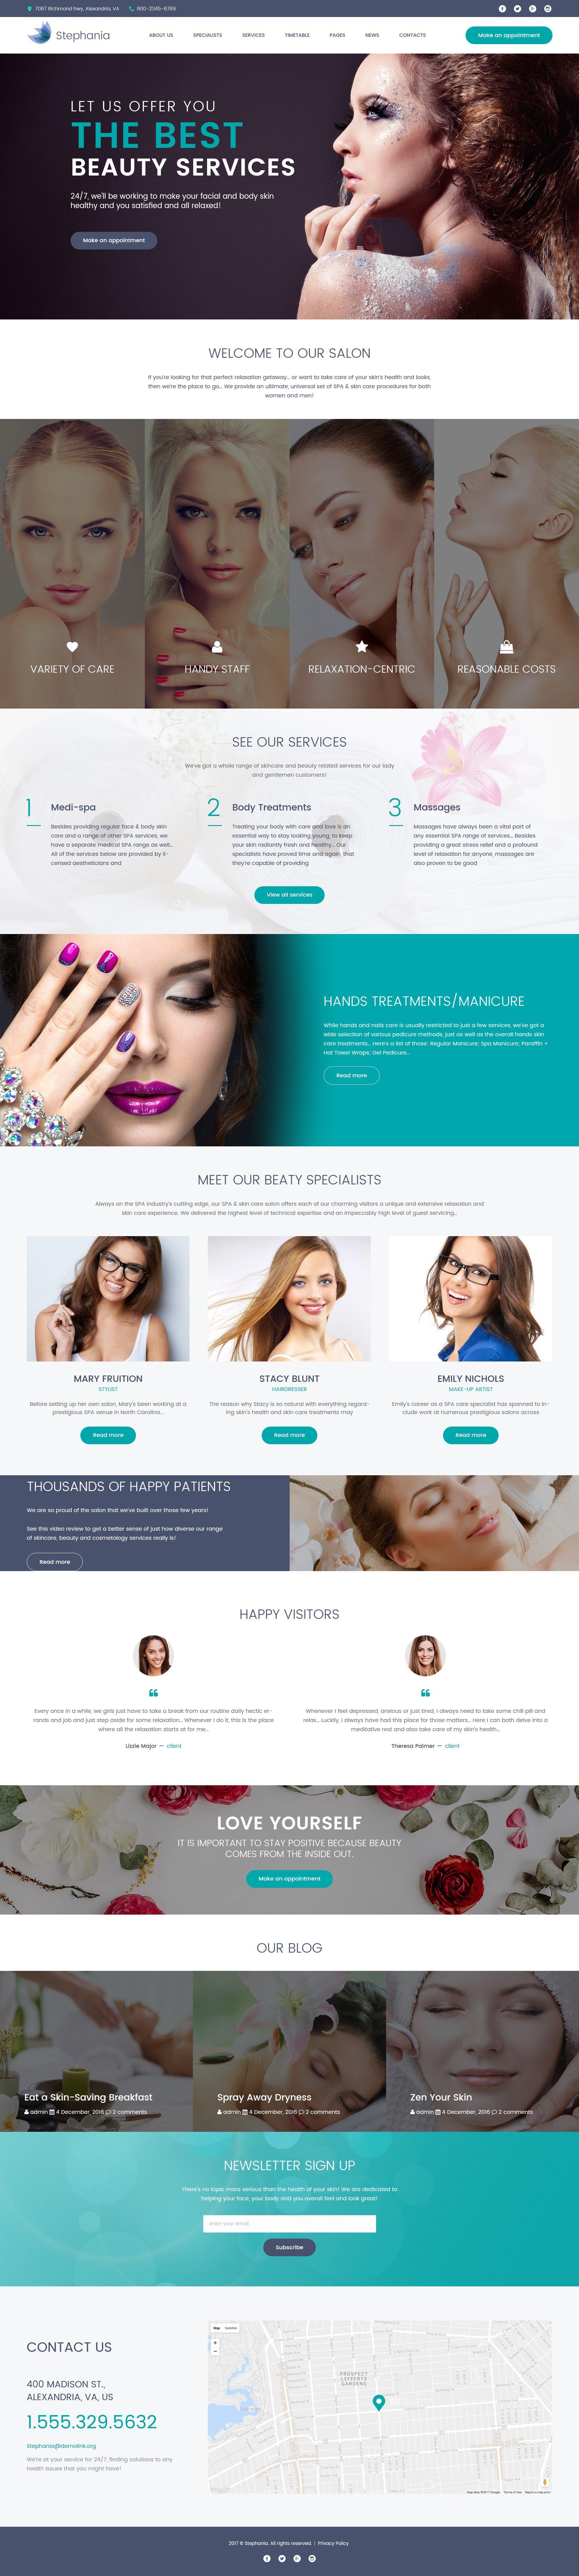 Responsivt Stephania - Beauty Salon & Skin Care WordPress-tema #62366 - skärmbild